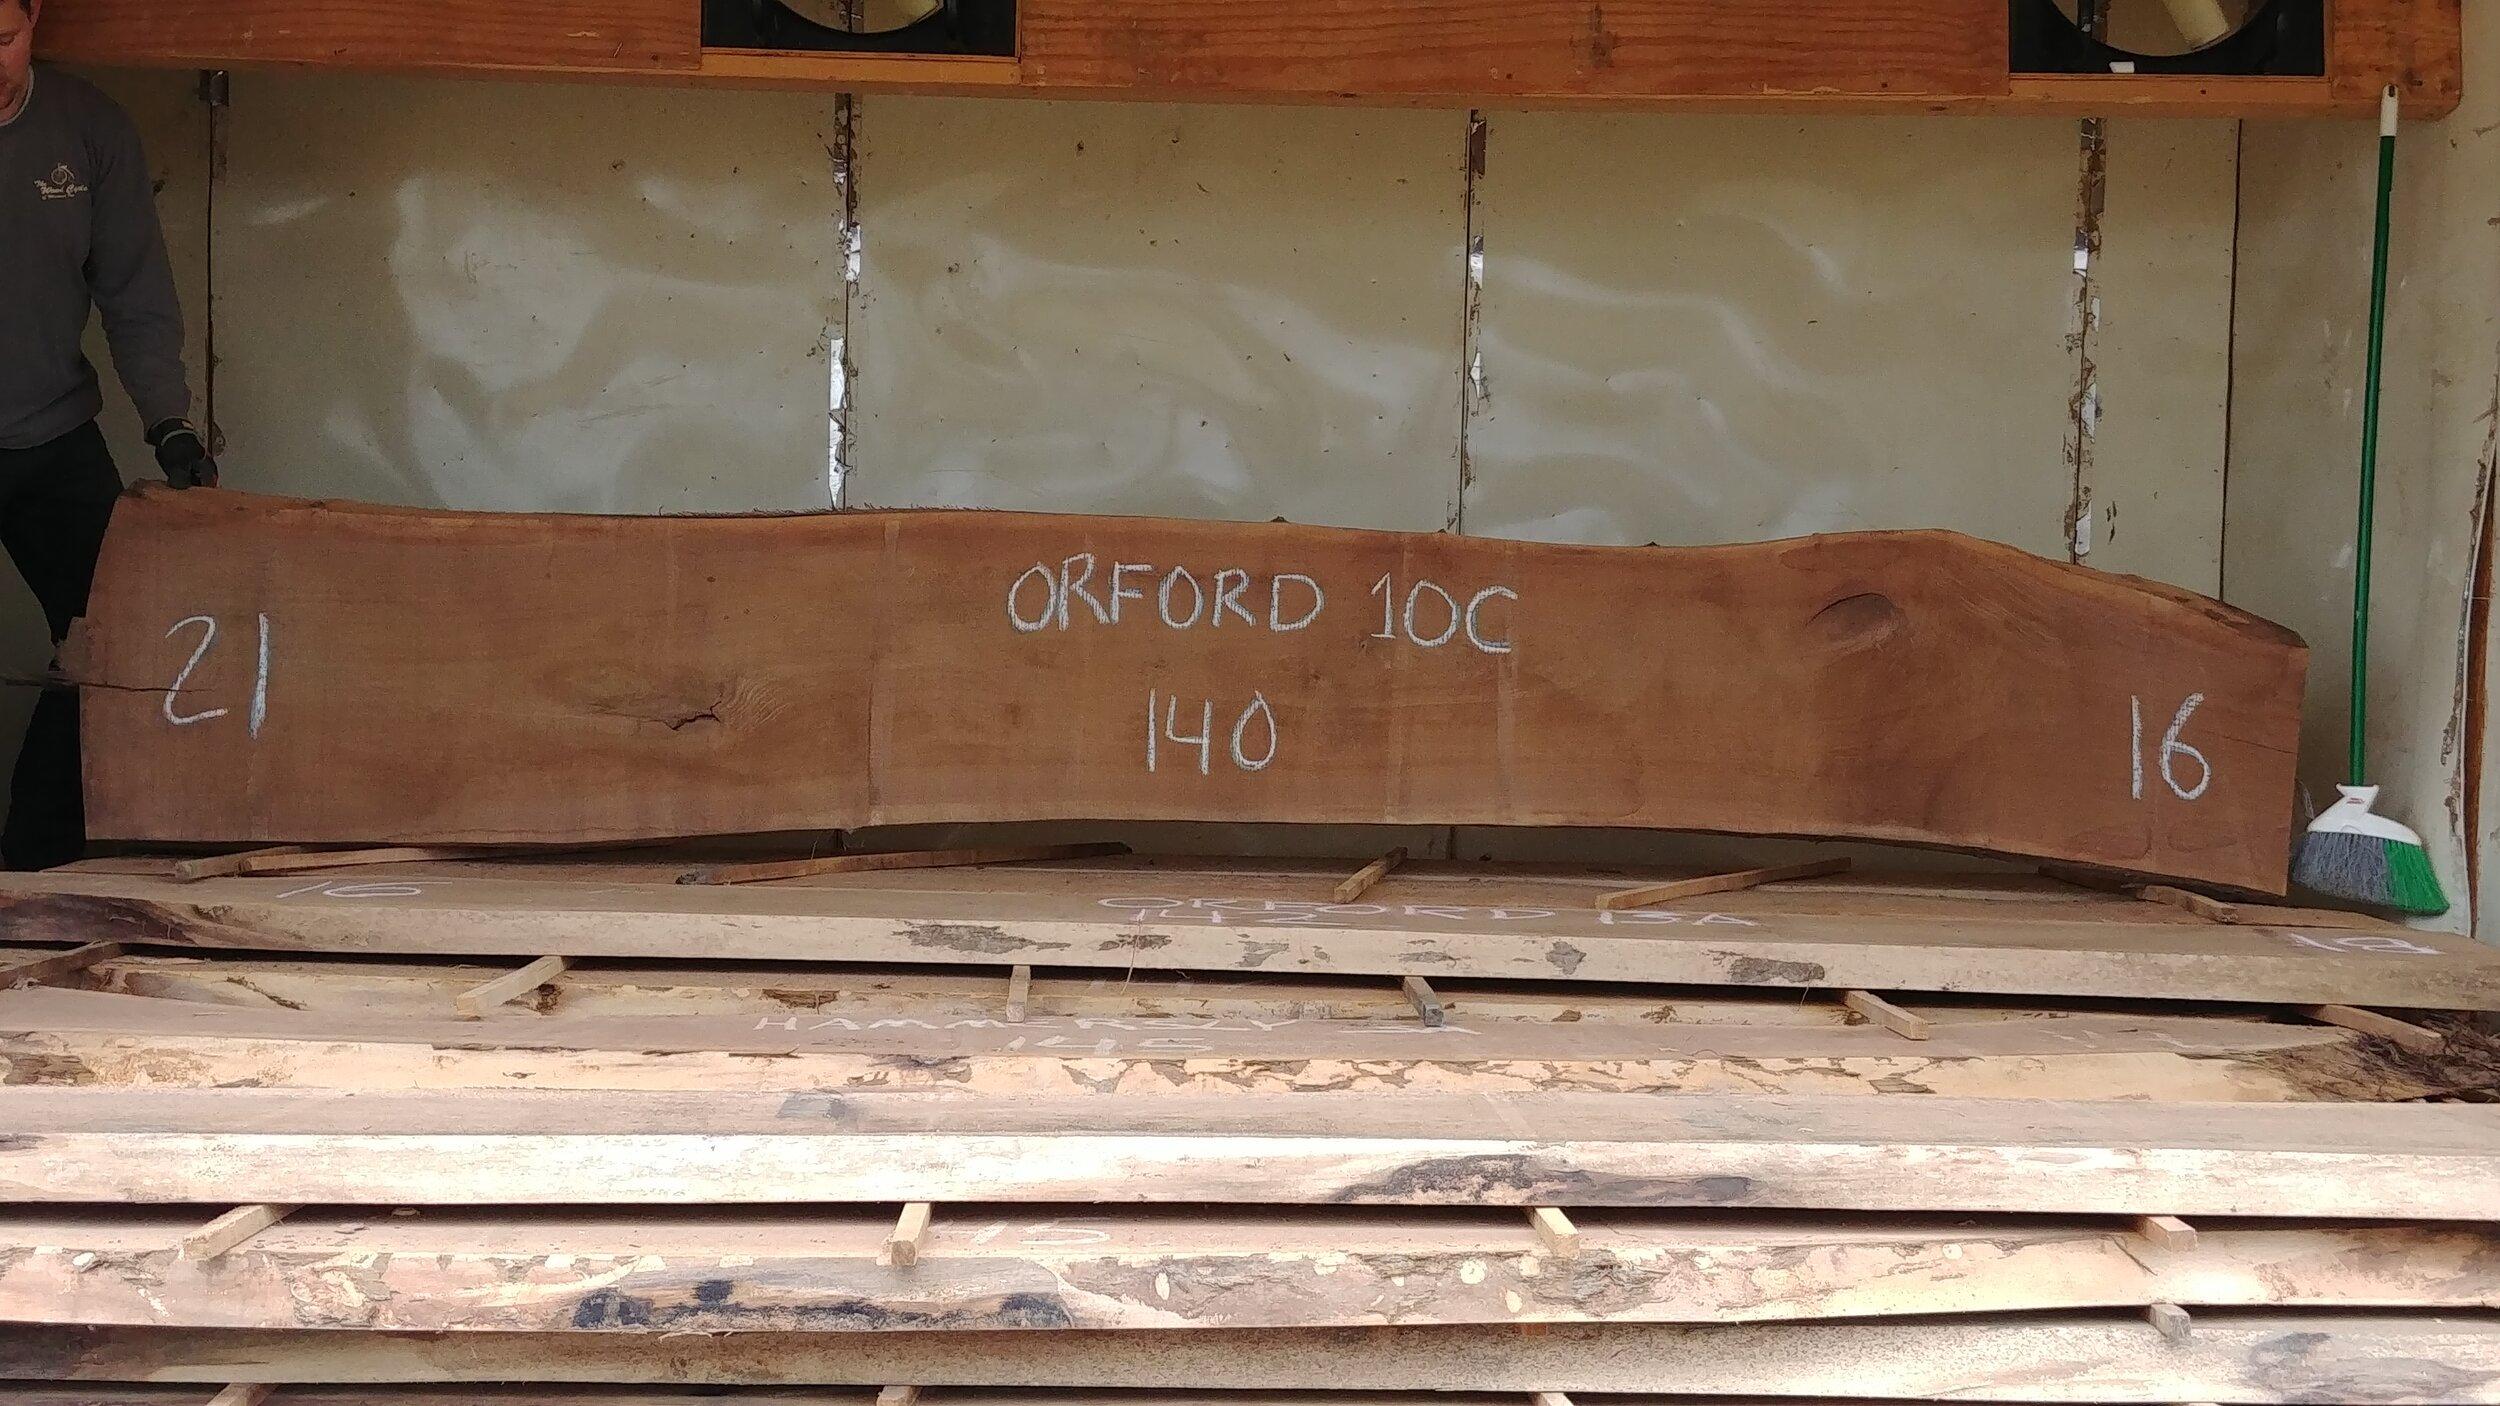 Orford 10C.jpg